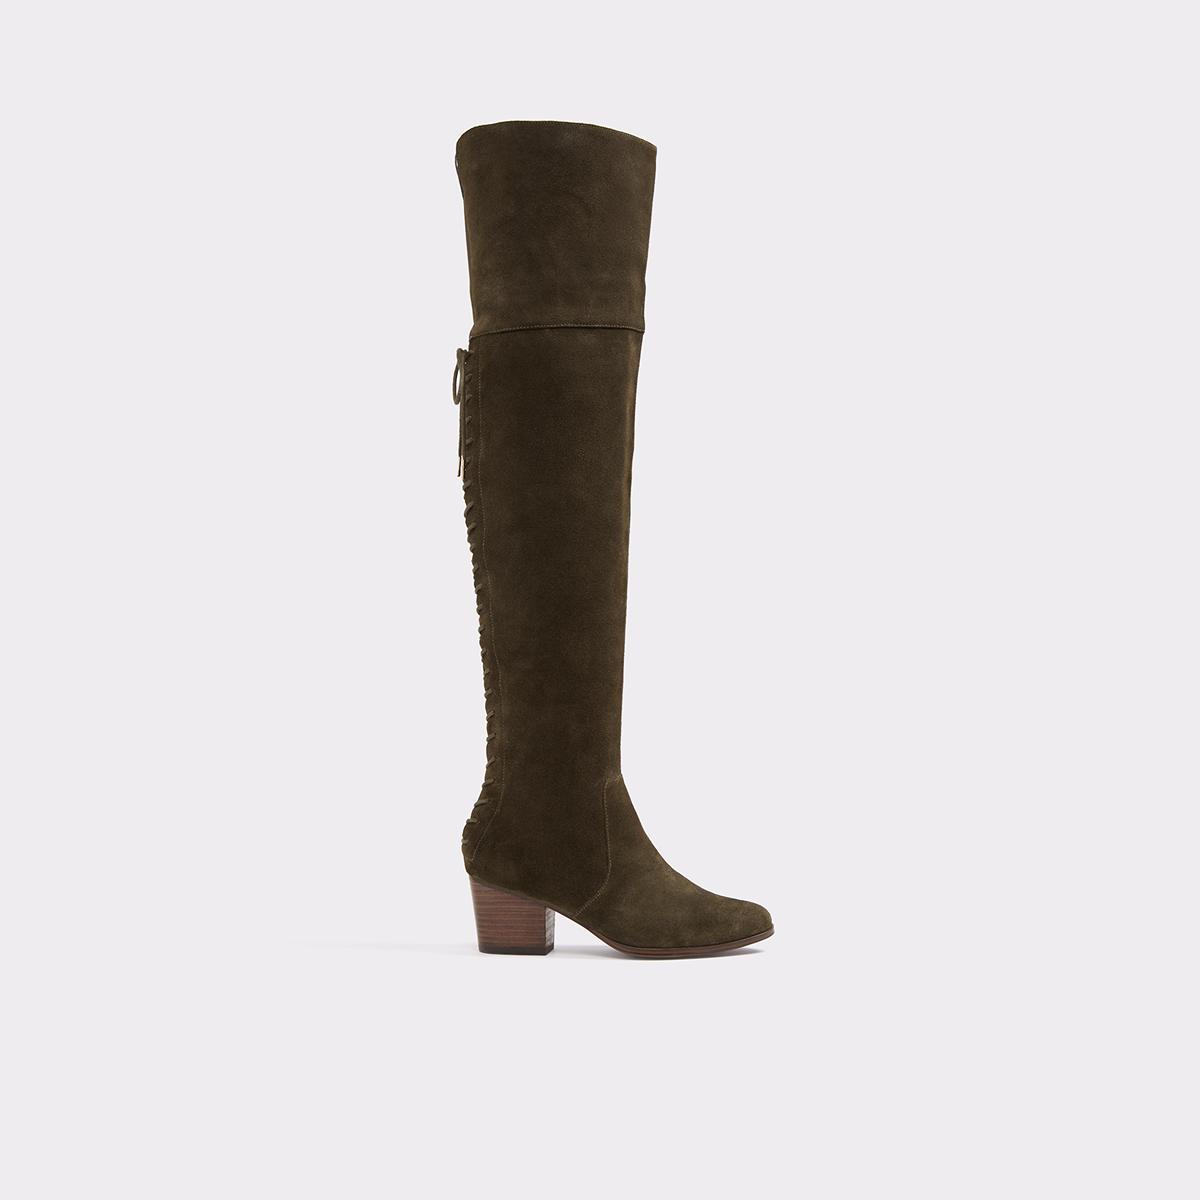 a6dbfe00451 Bresa Khaki Women s Boots